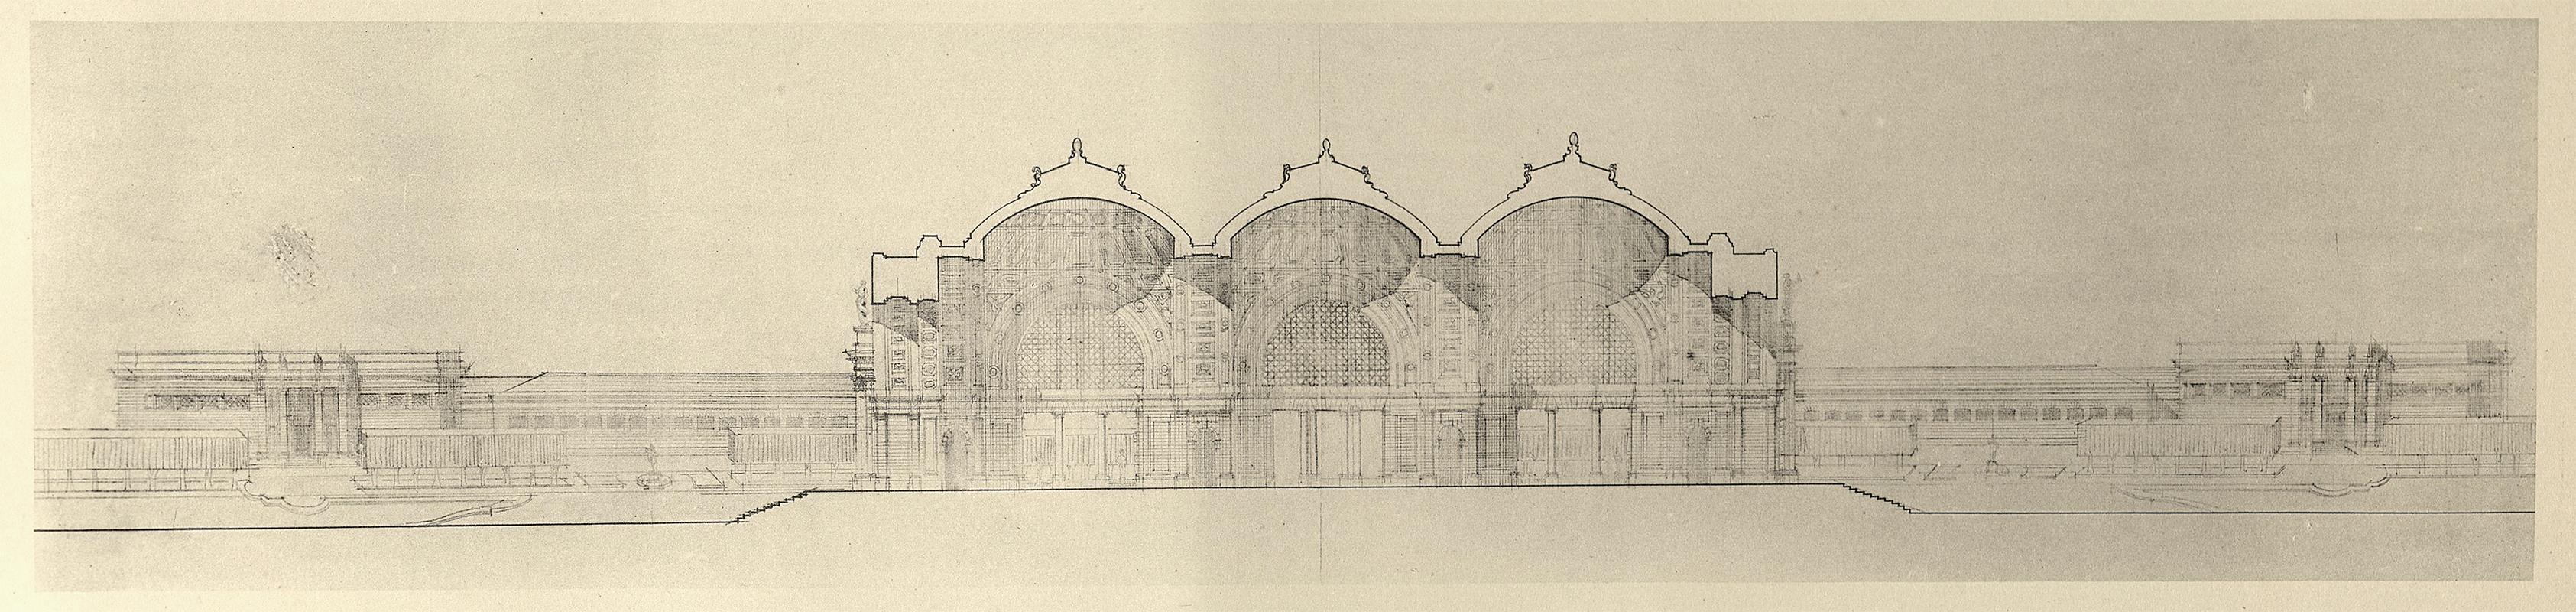 Charles Lemaresquier. Les Grands Prix de Rome v.4 1900, 479